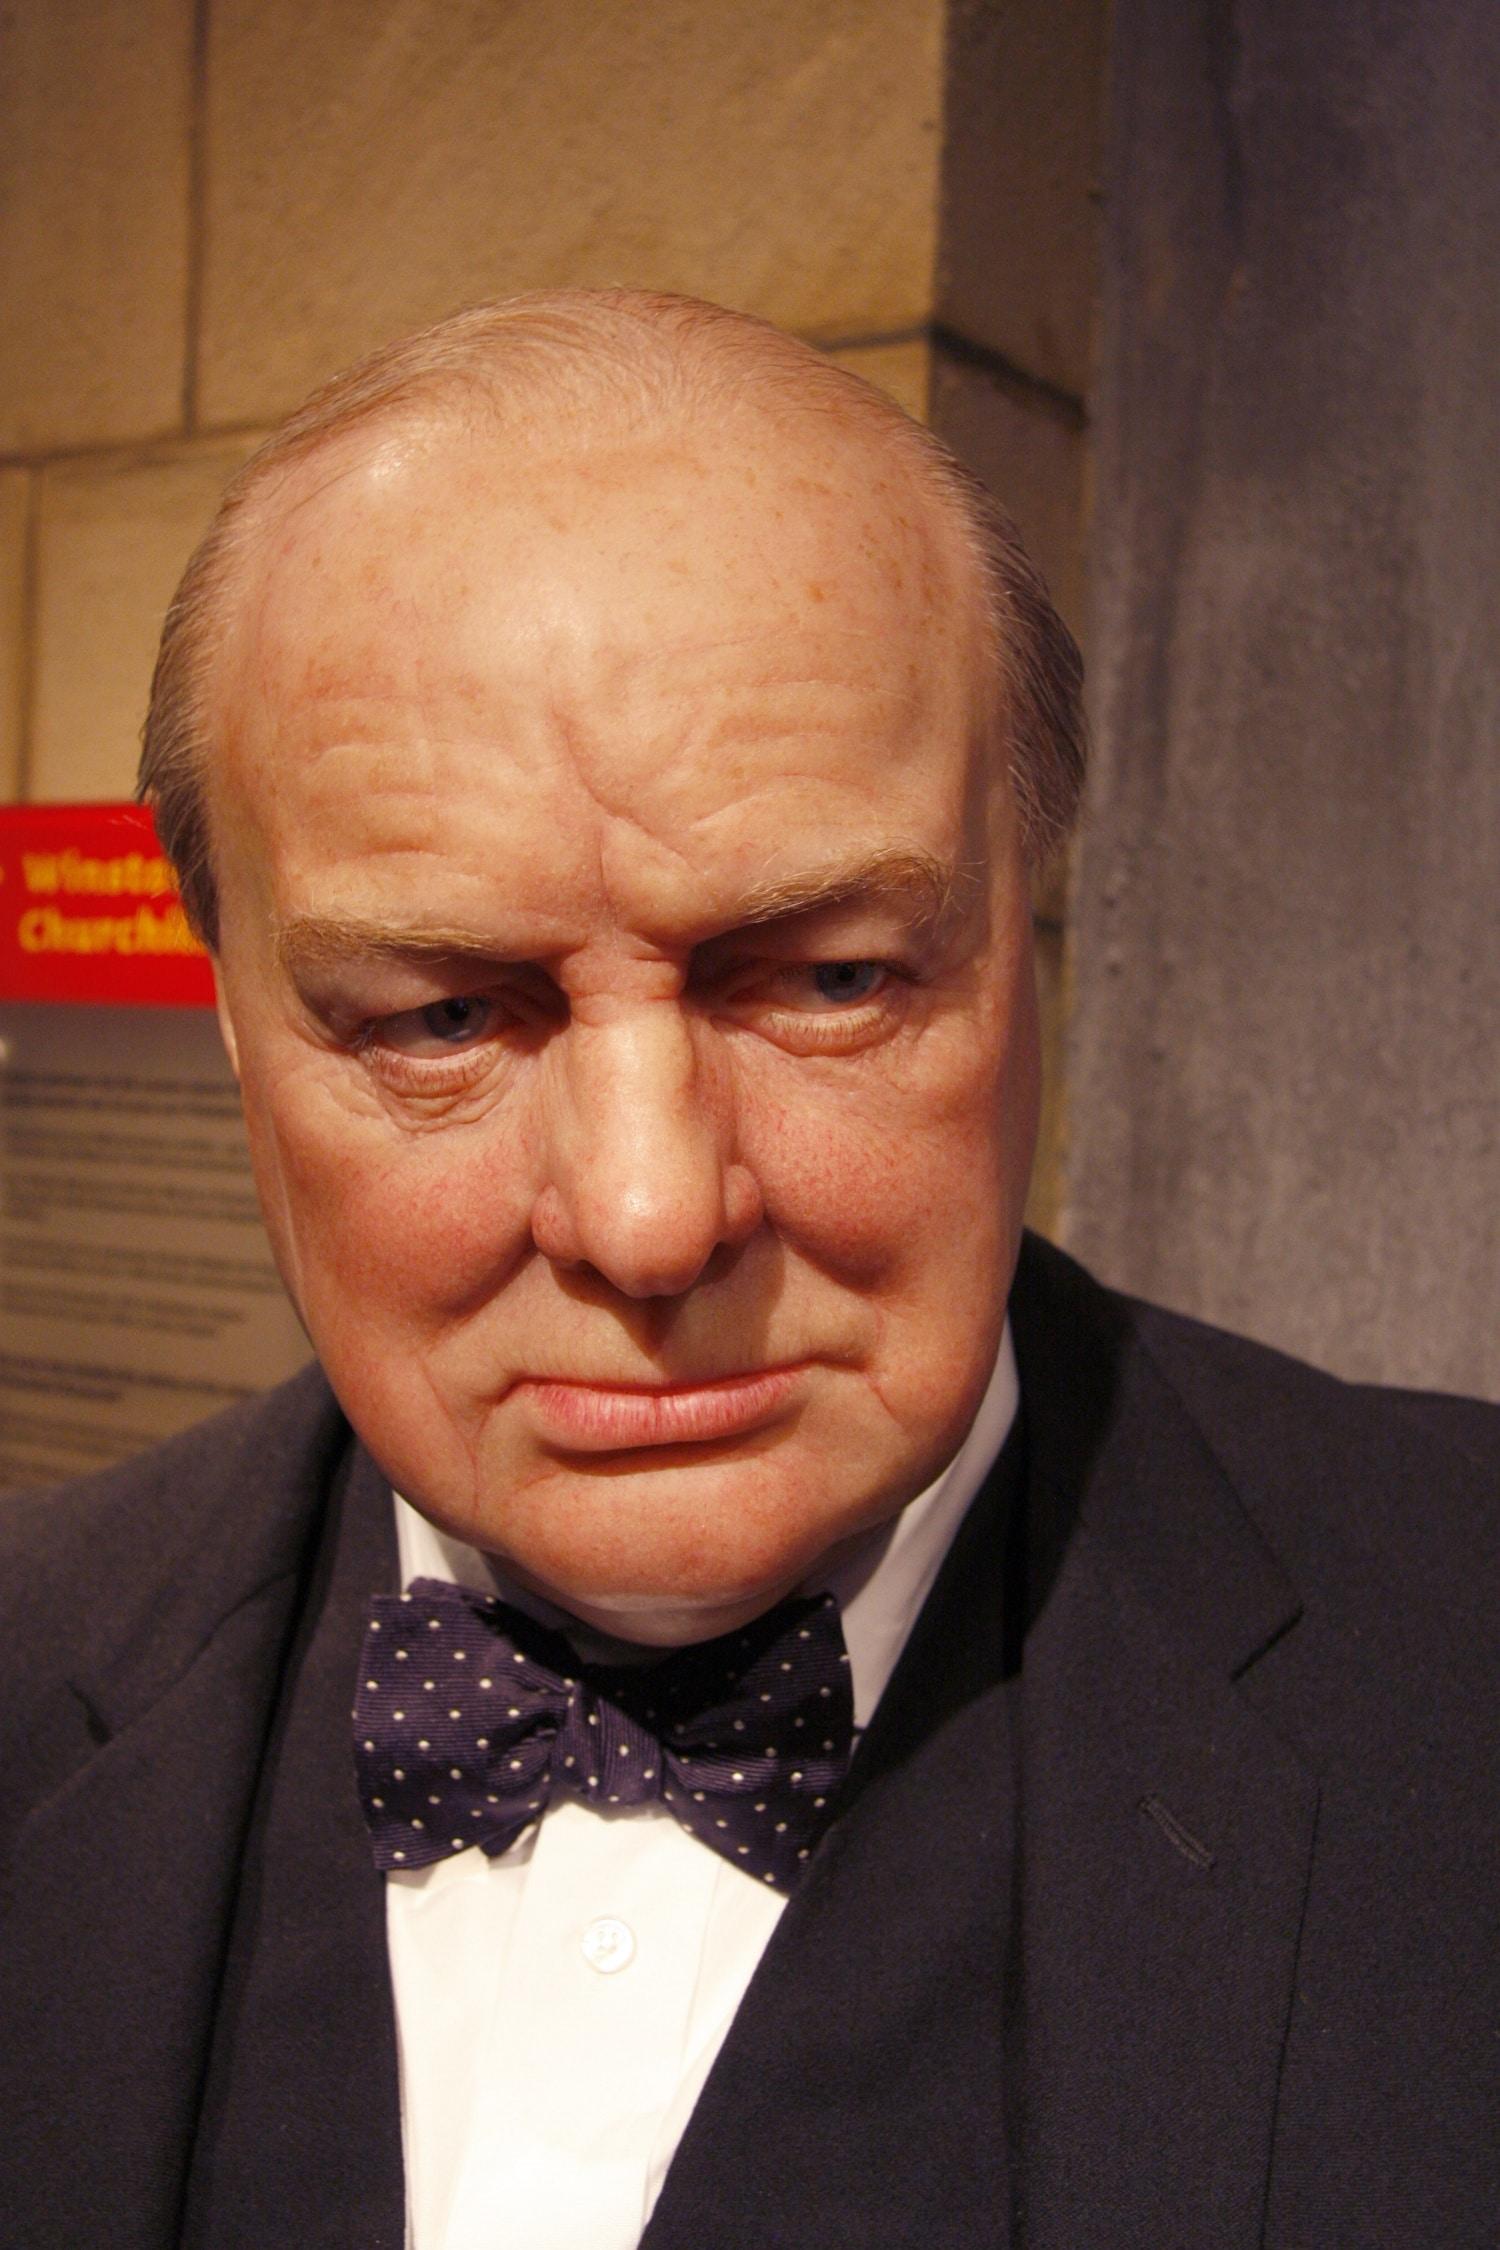 Briliáns idézetek Sir Winston Churchill tollából